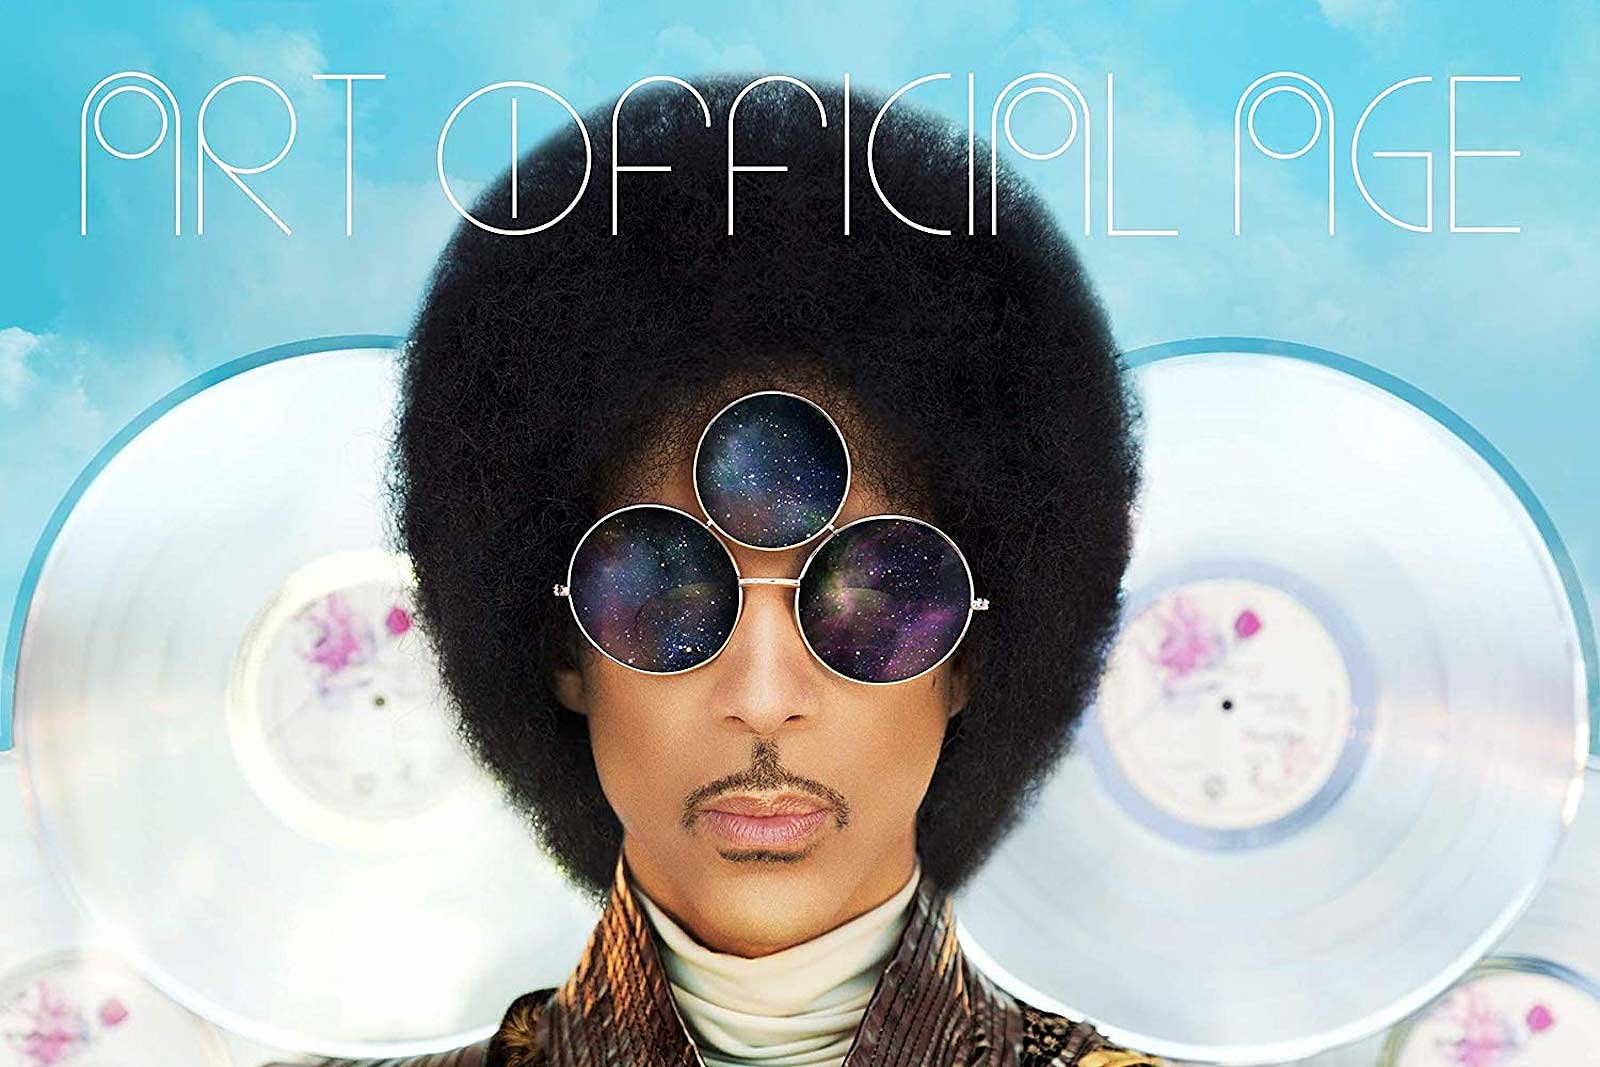 Prince-Art-Official-Age-Warner-Bros-Album-Image.jpg